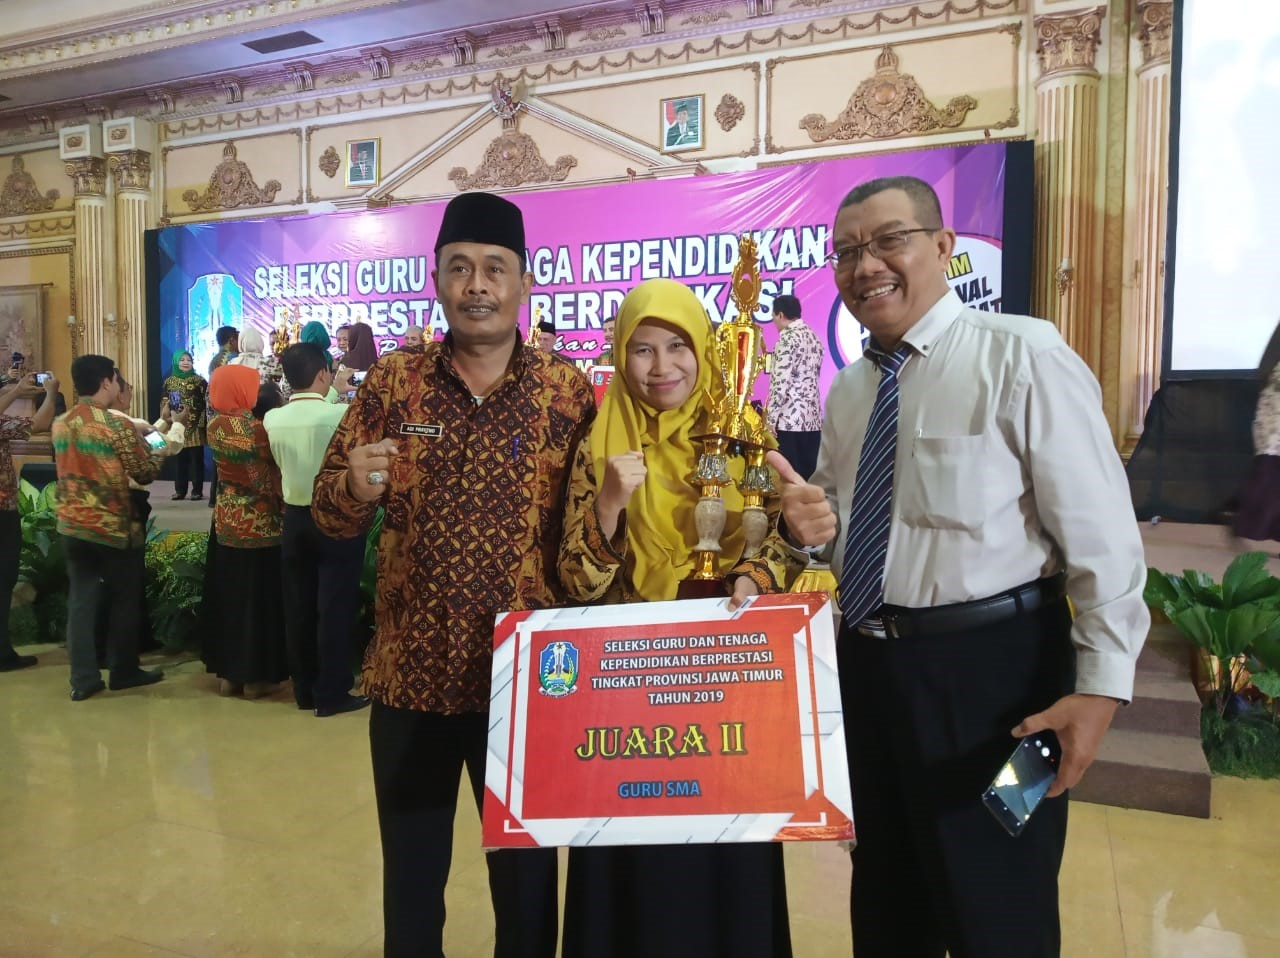 Dewi Insani, Guru Berprestasi Tingkat Provinsi 2019